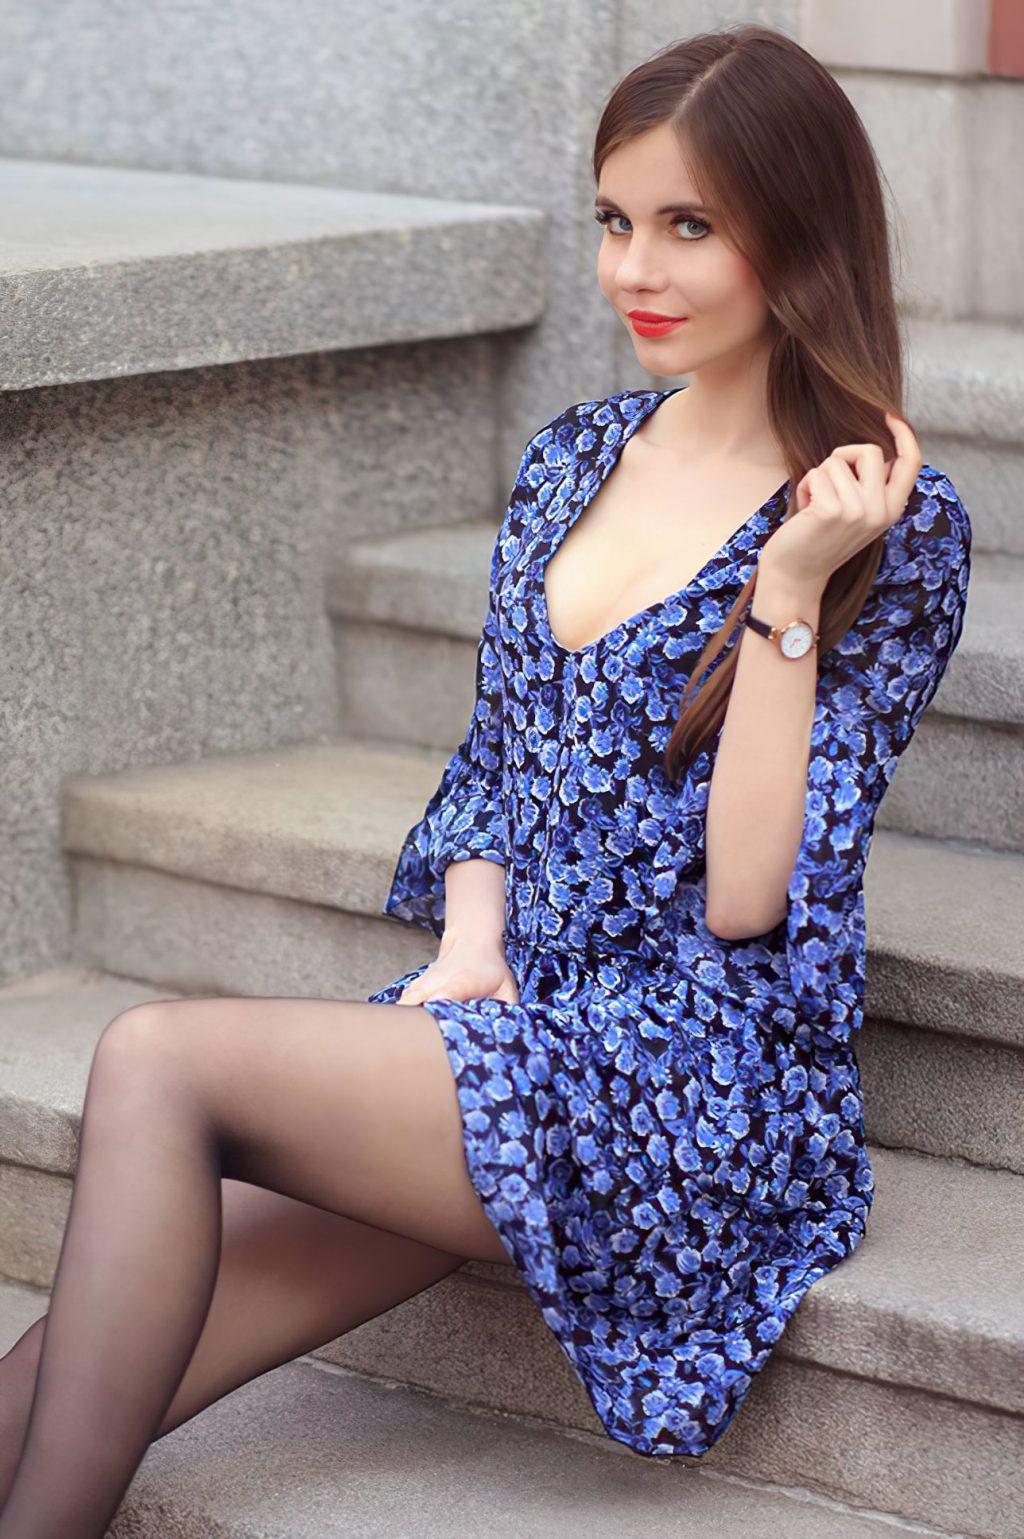 Ariadna Majewska Poses in a Sexy Blue Dress (10 Photos)